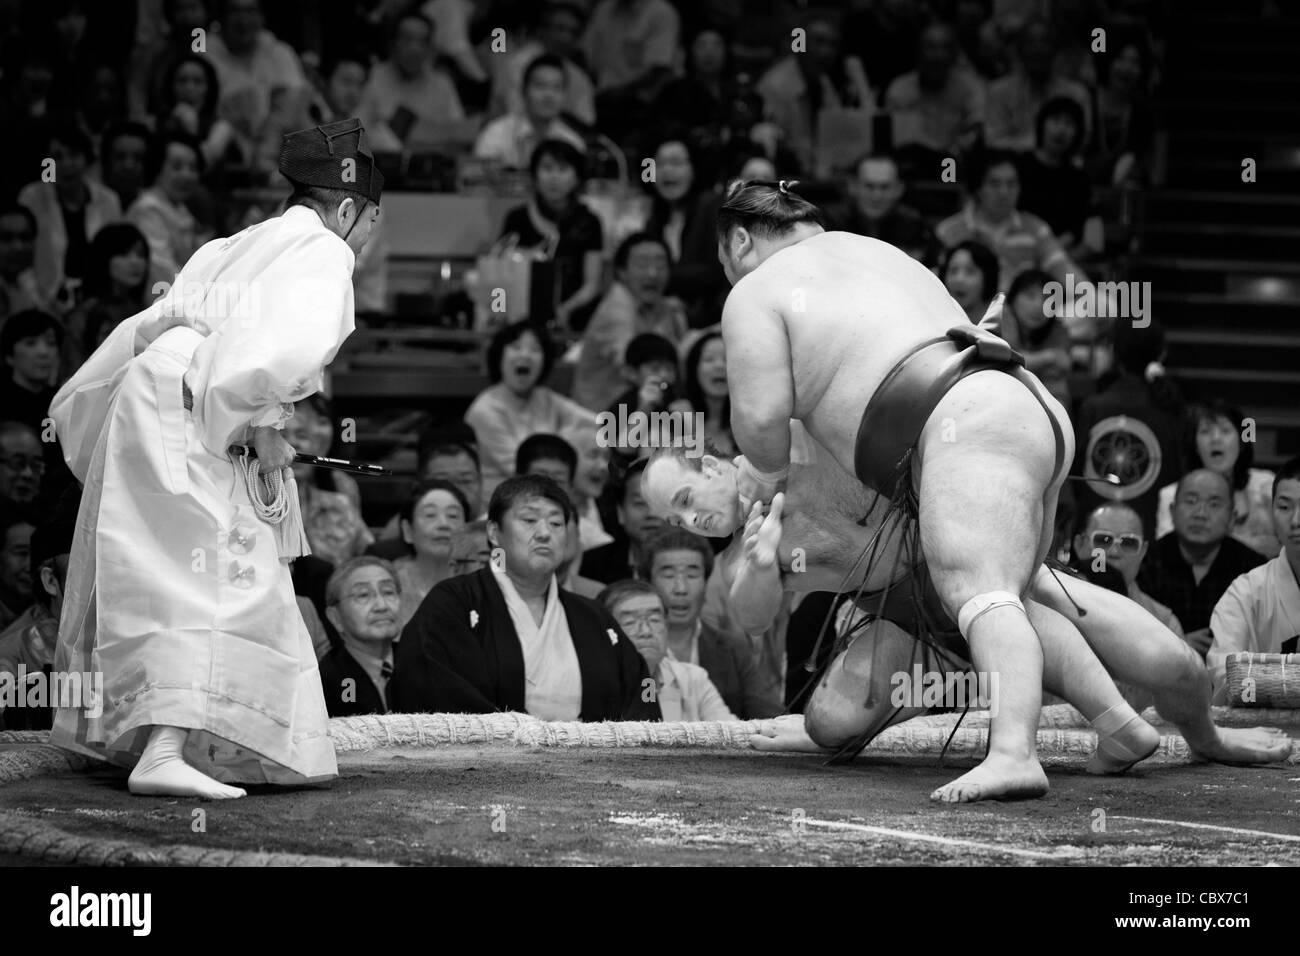 Ceca lottatore di sumo takanoyama essendo buttato a terra - ryogoku kokugikan, Tokyo, Giappone Immagini Stock